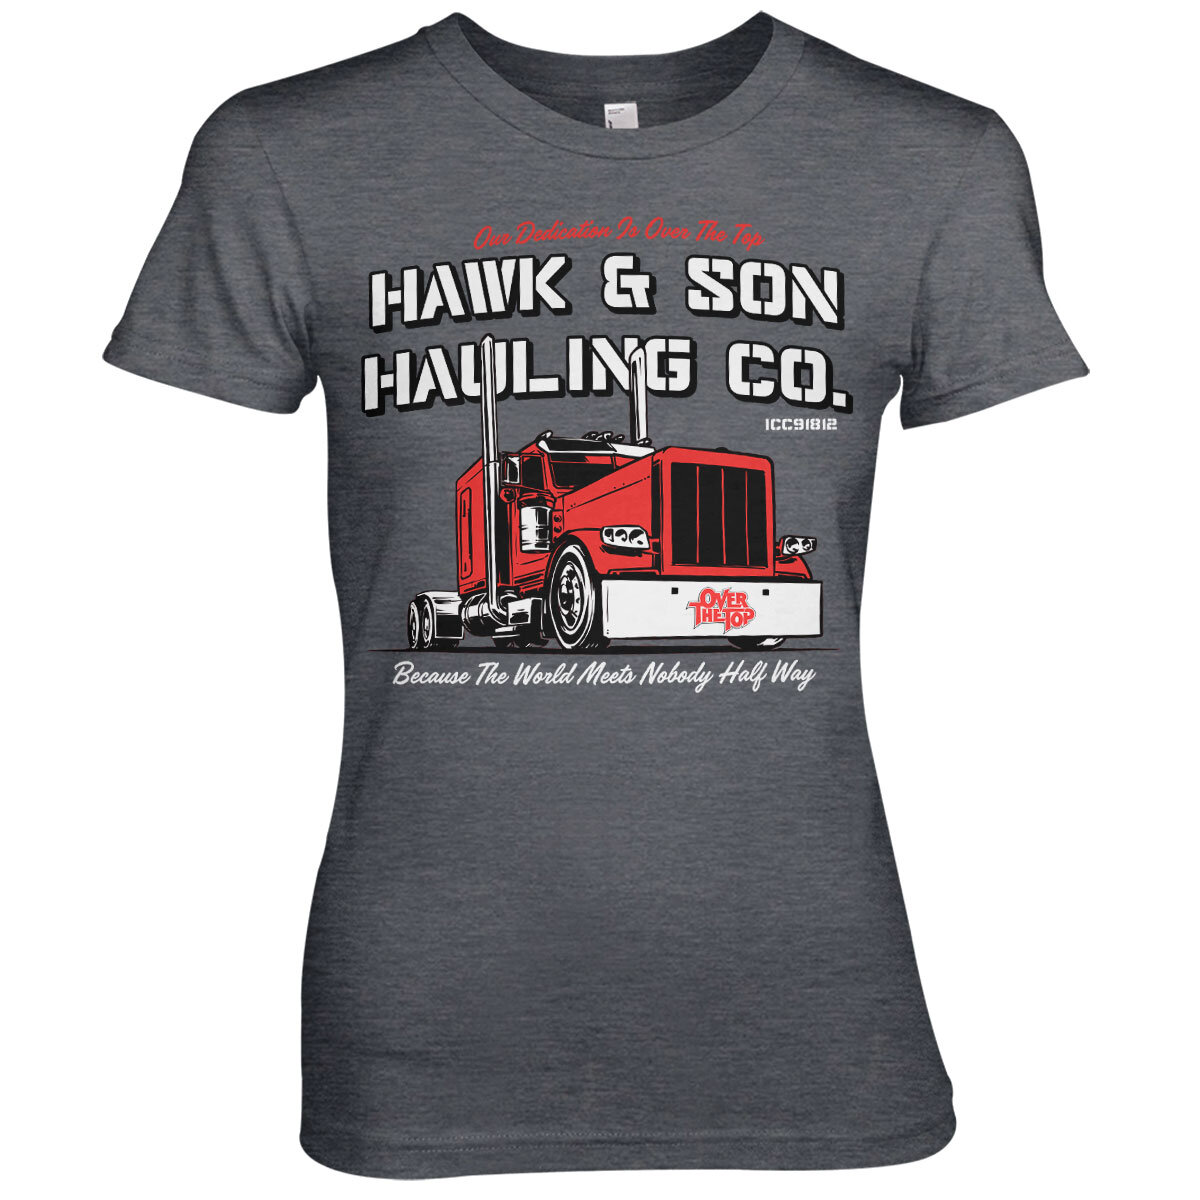 Hawk & Son Hauling Co Girly Tee